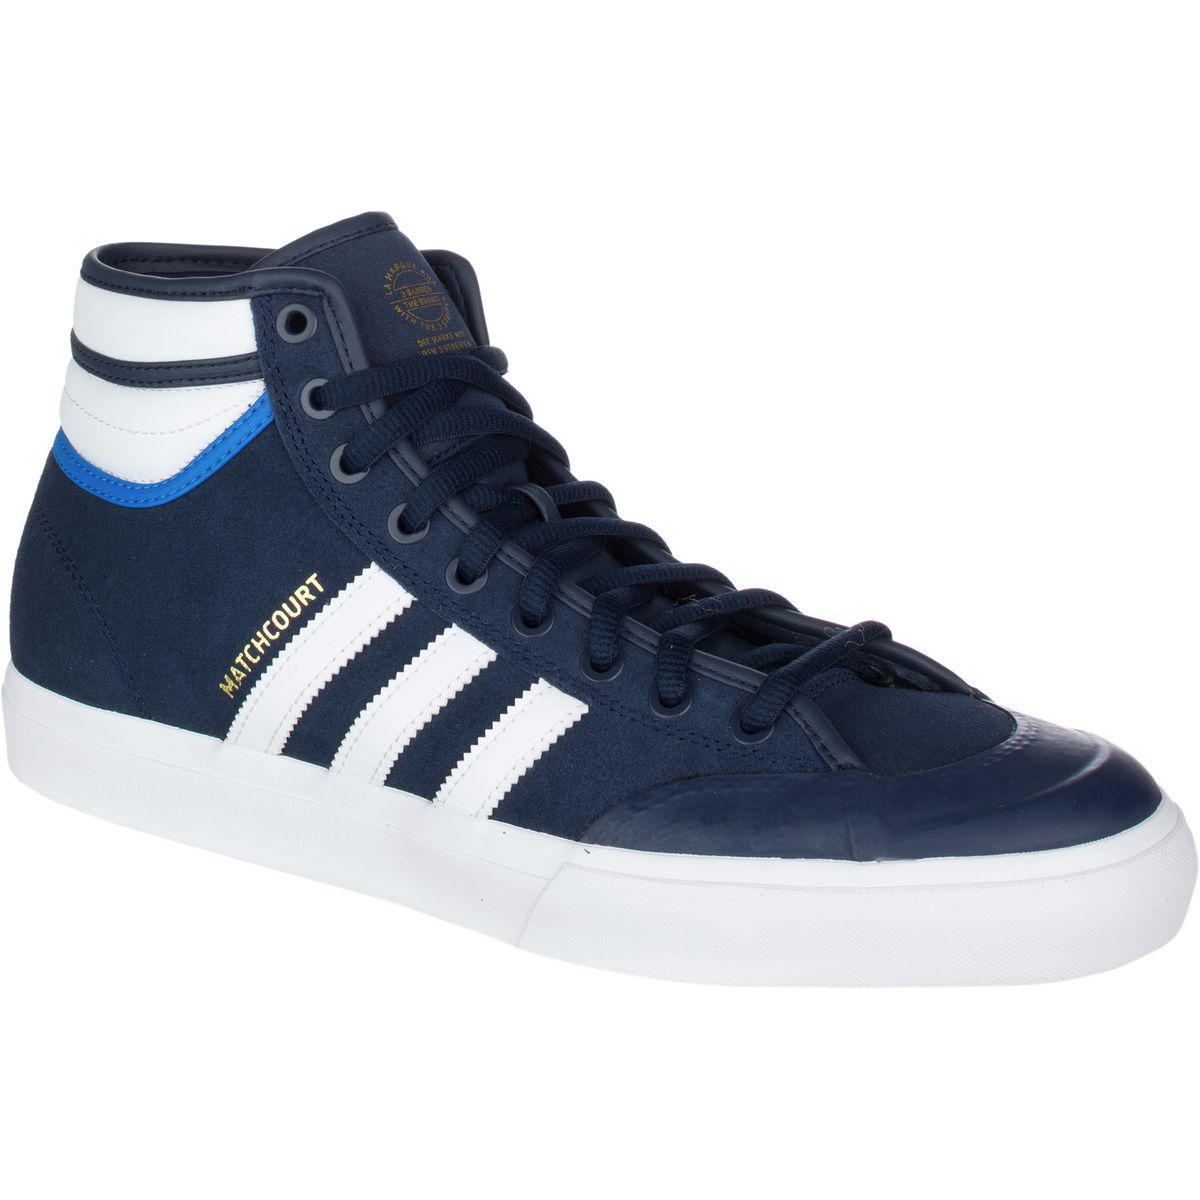 lyst adidas matchcourt alto rx2 top ten scarpa blu per gli uomini.